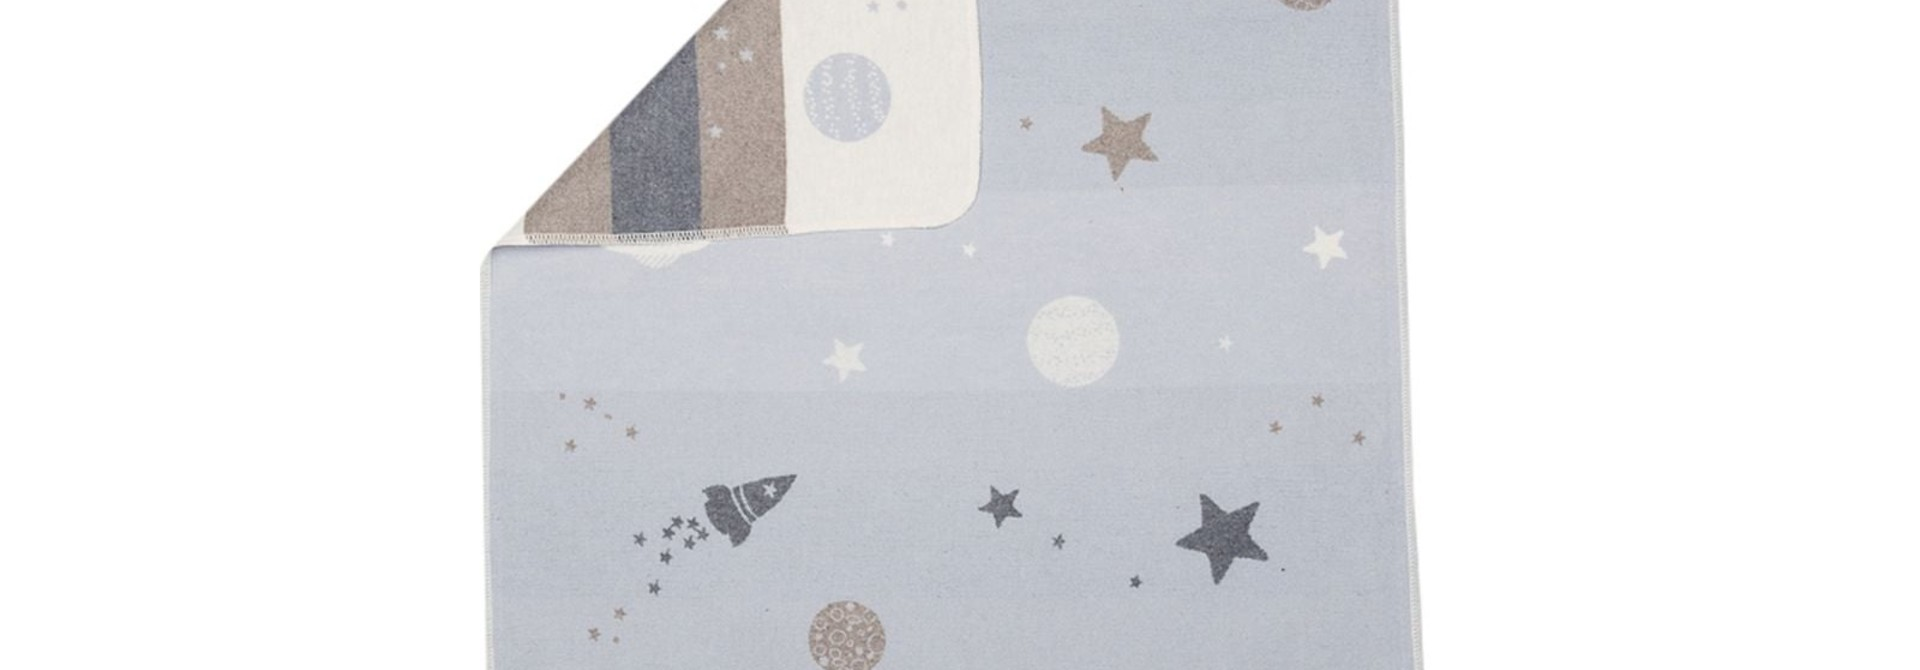 Blanket - Planets - Blue/Grey